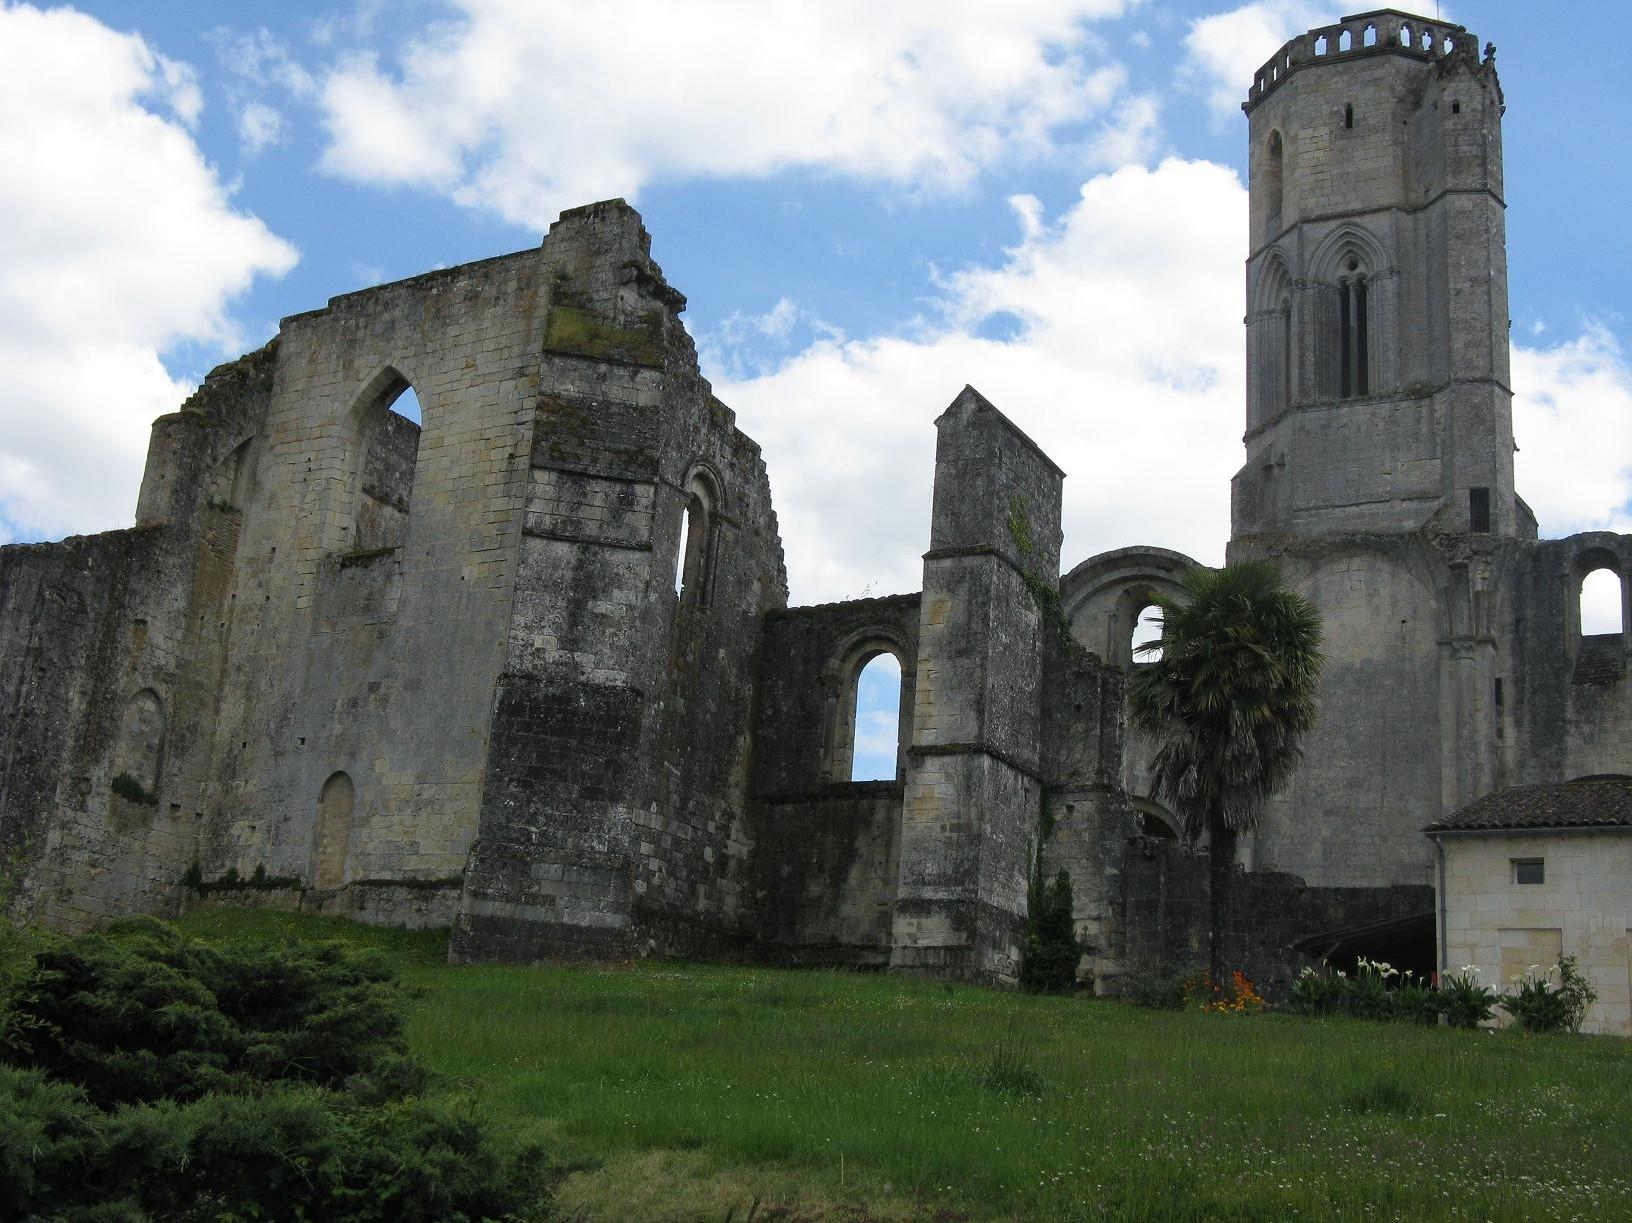 https://static.blog4ever.com/2014/01/762036/0025.-Abbaye-de-la-Sauve-Majeure--1-.jpg